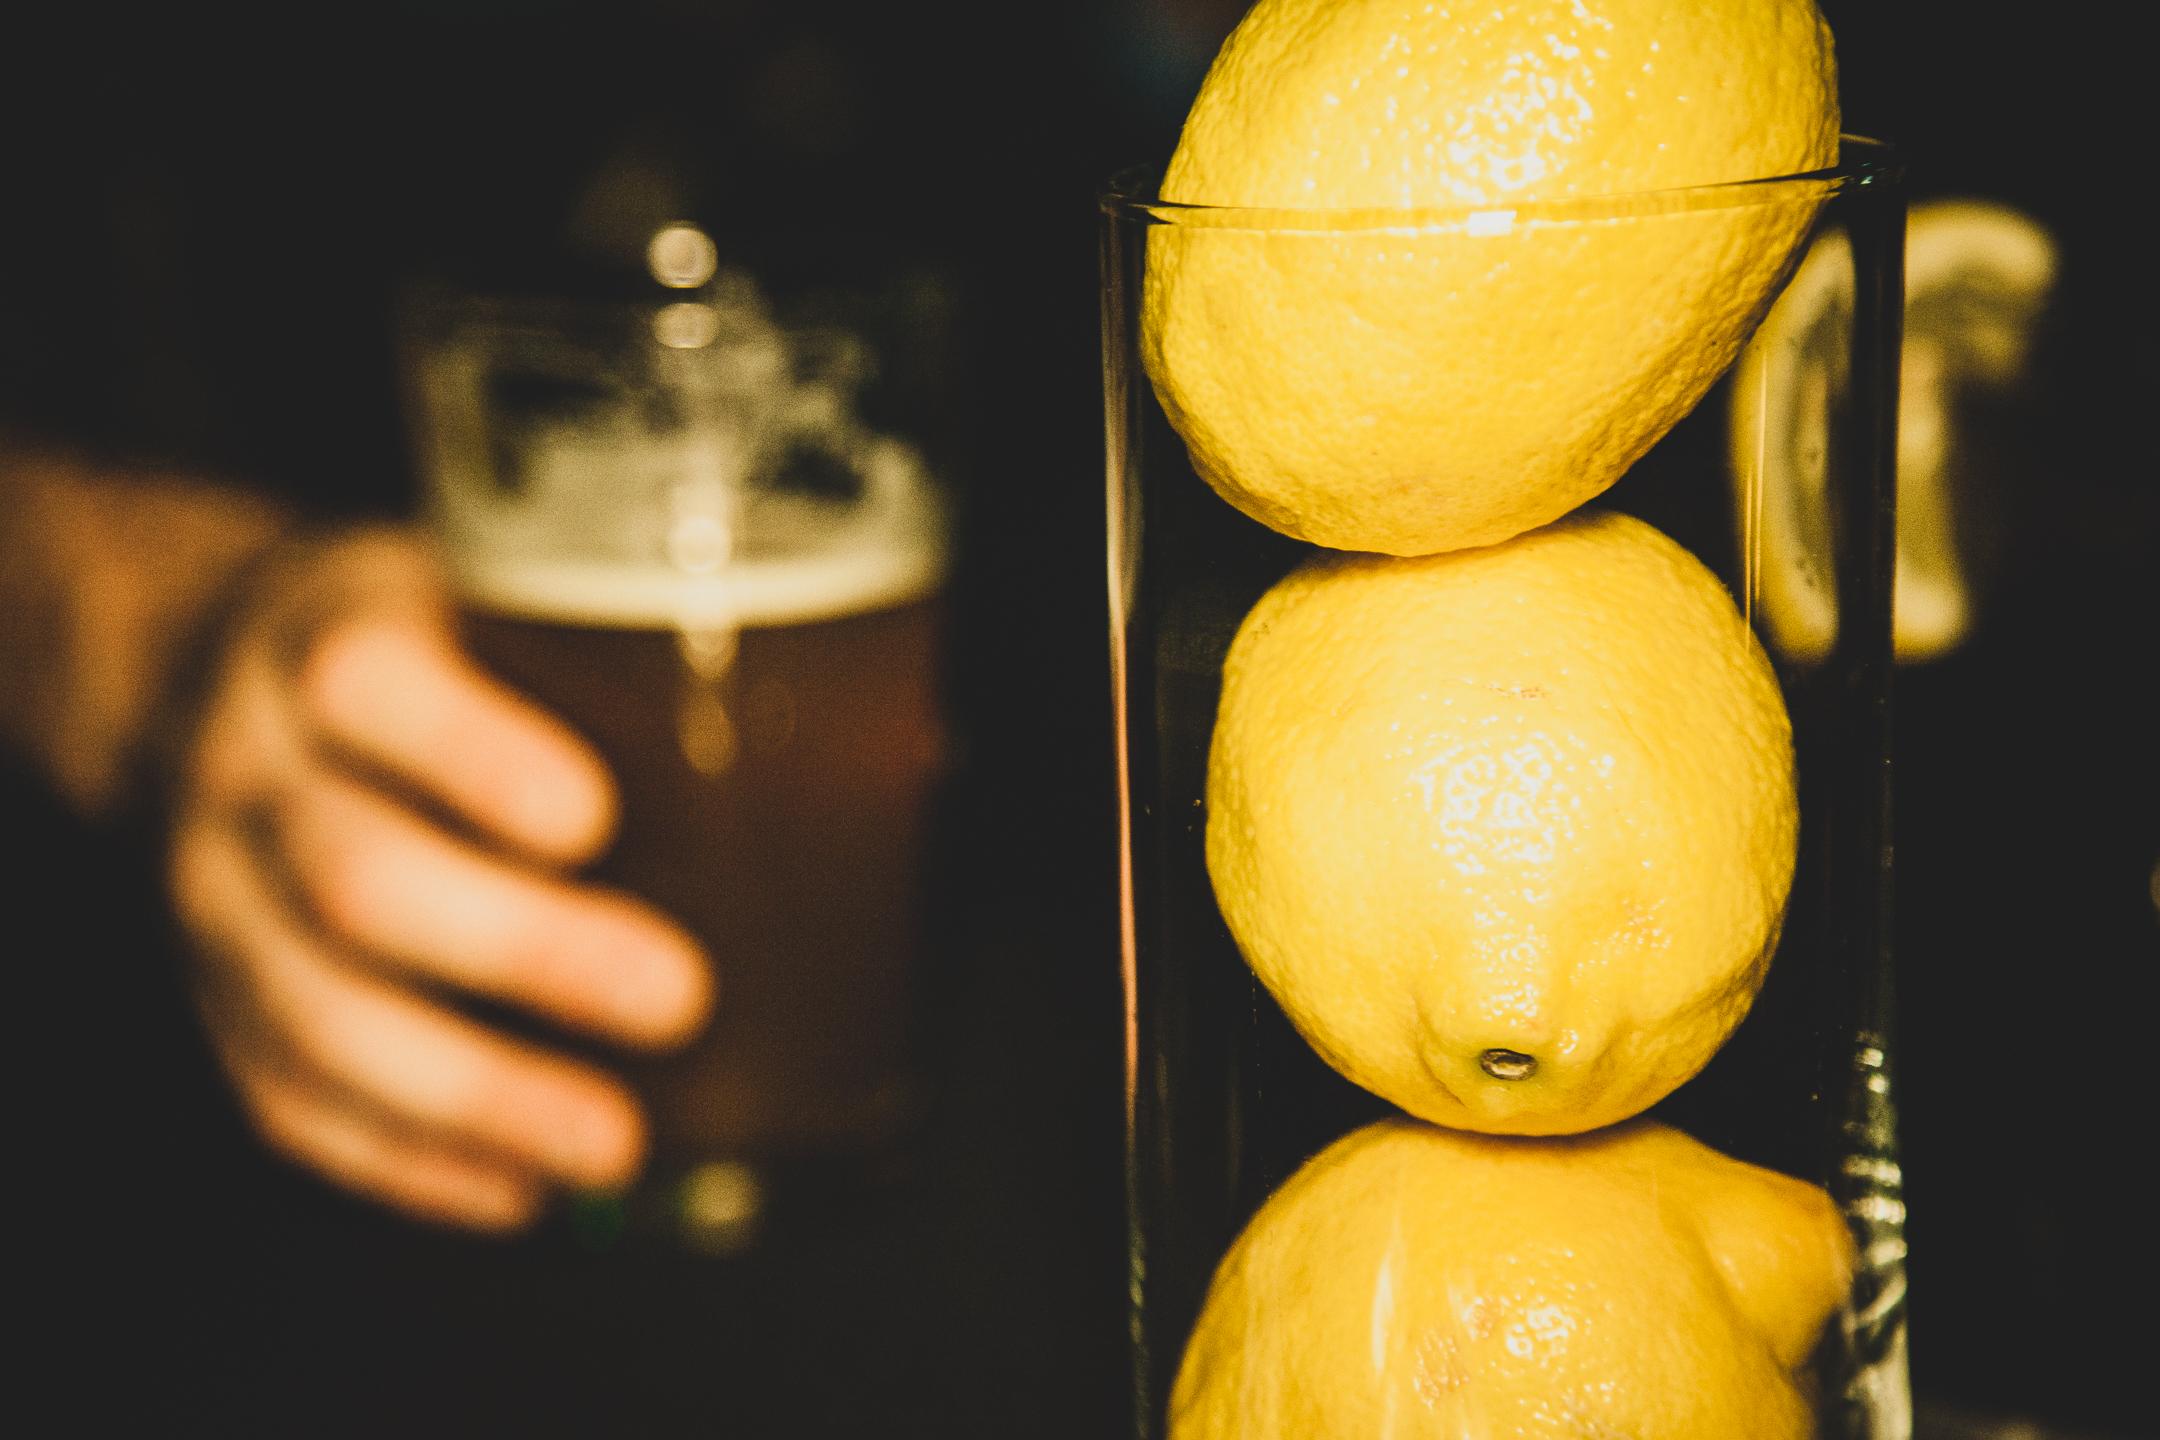 Lemonhaze 6-6-19 (2160)-1070.jpg